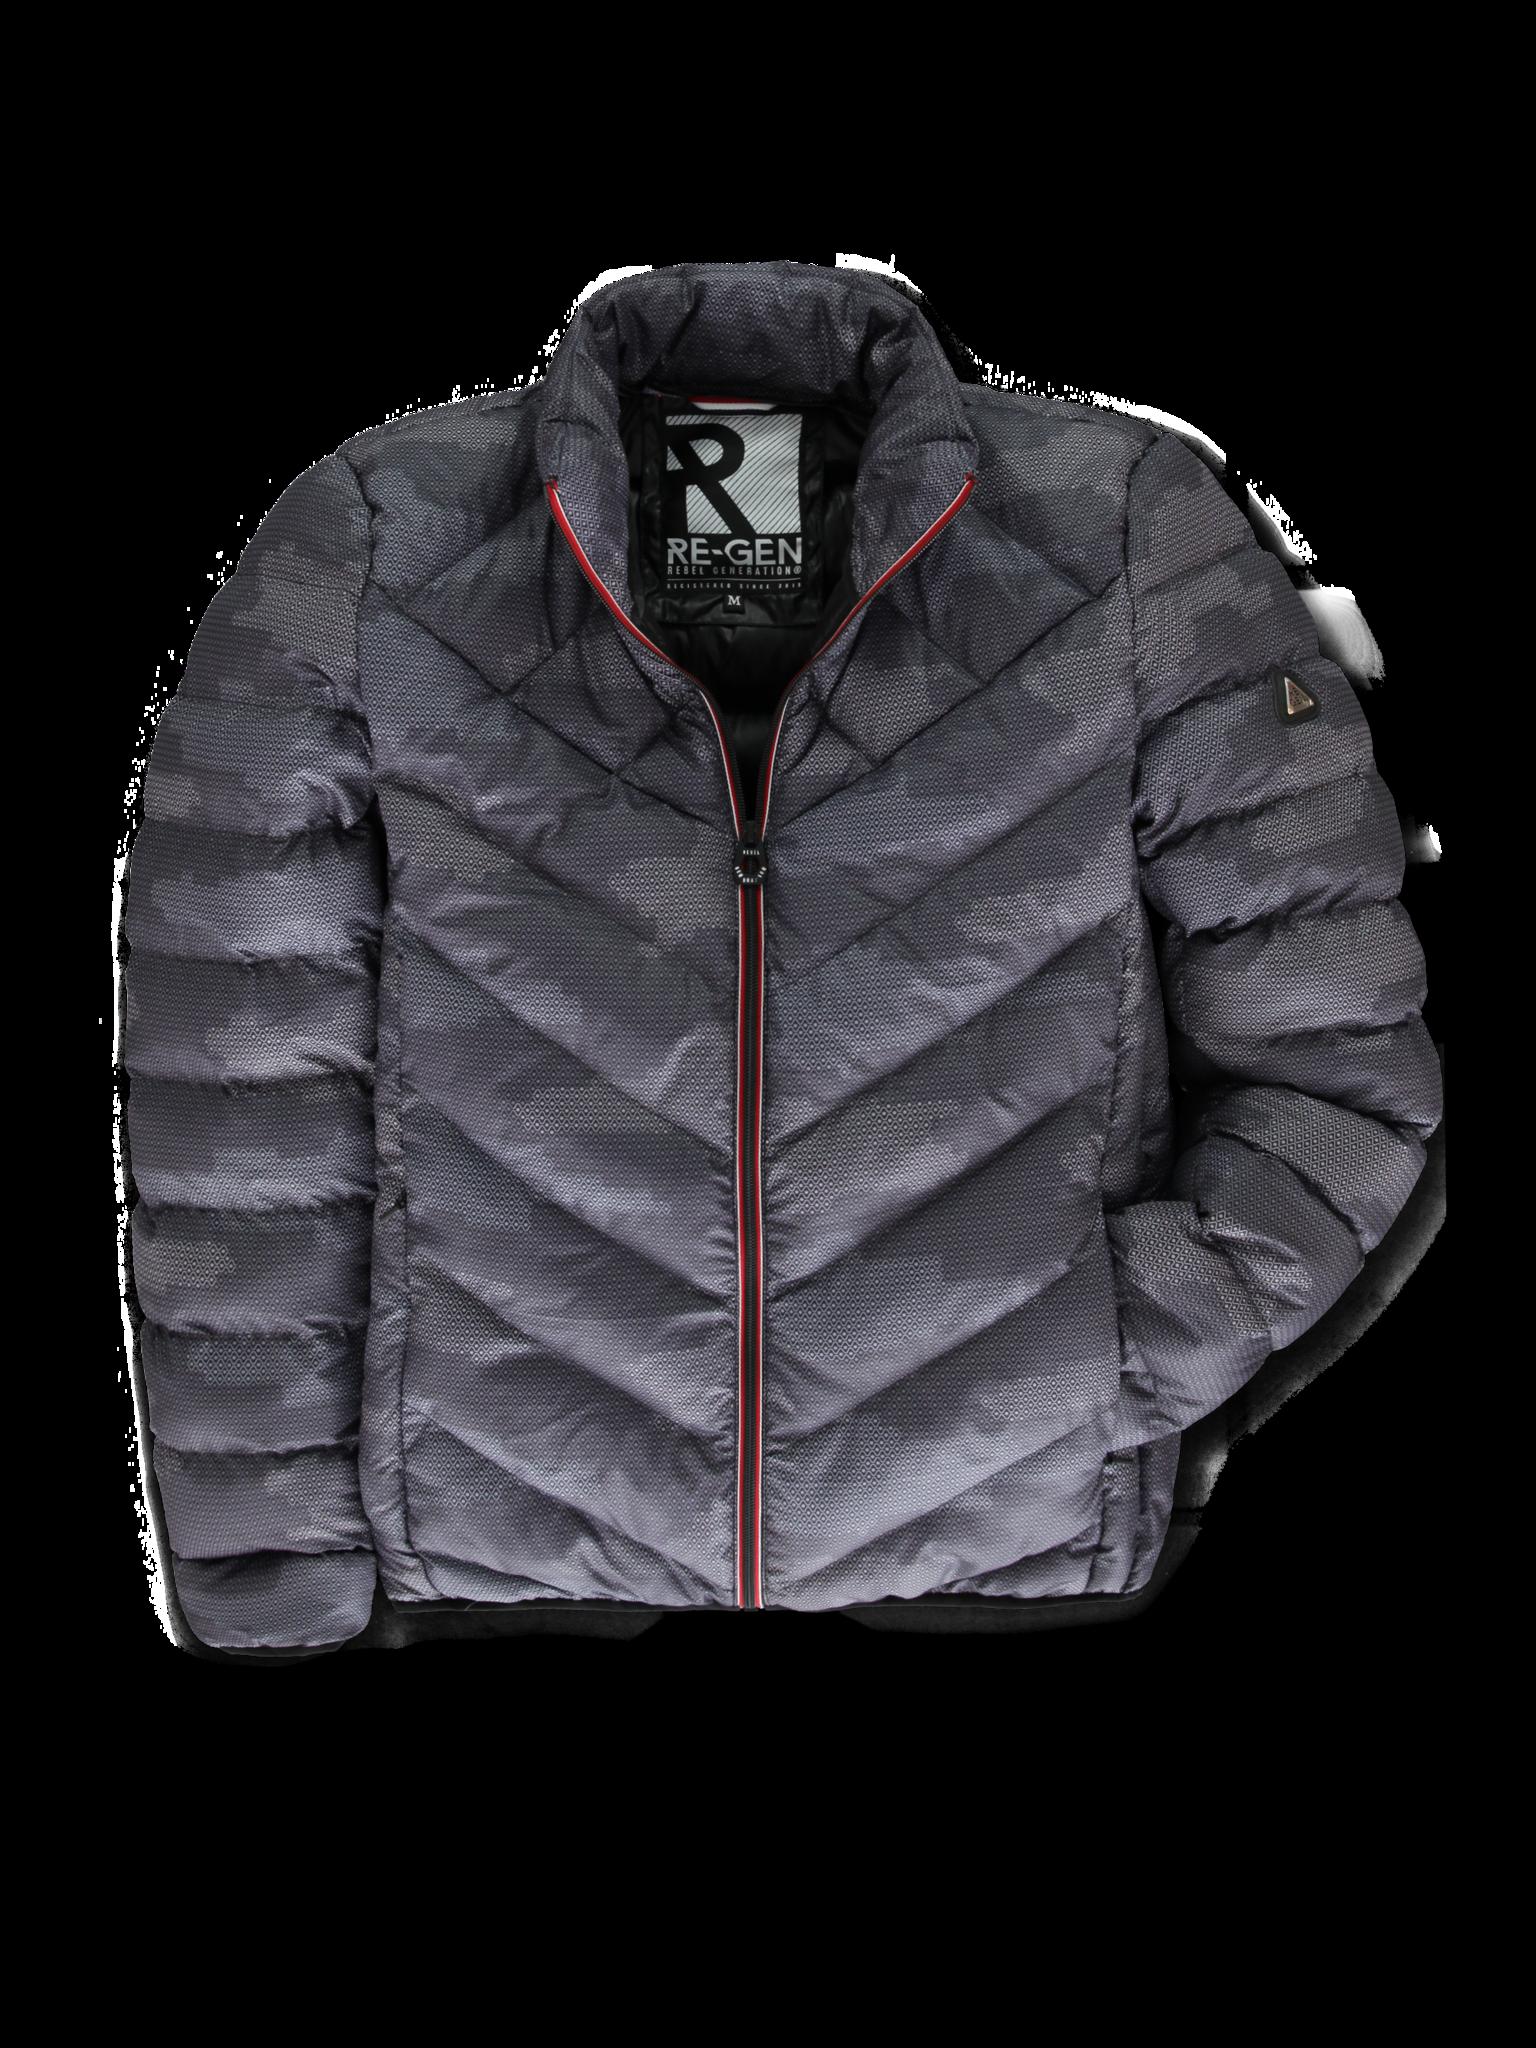 REGEN   Winter 2019 Men   Jacket   12 pcs/box